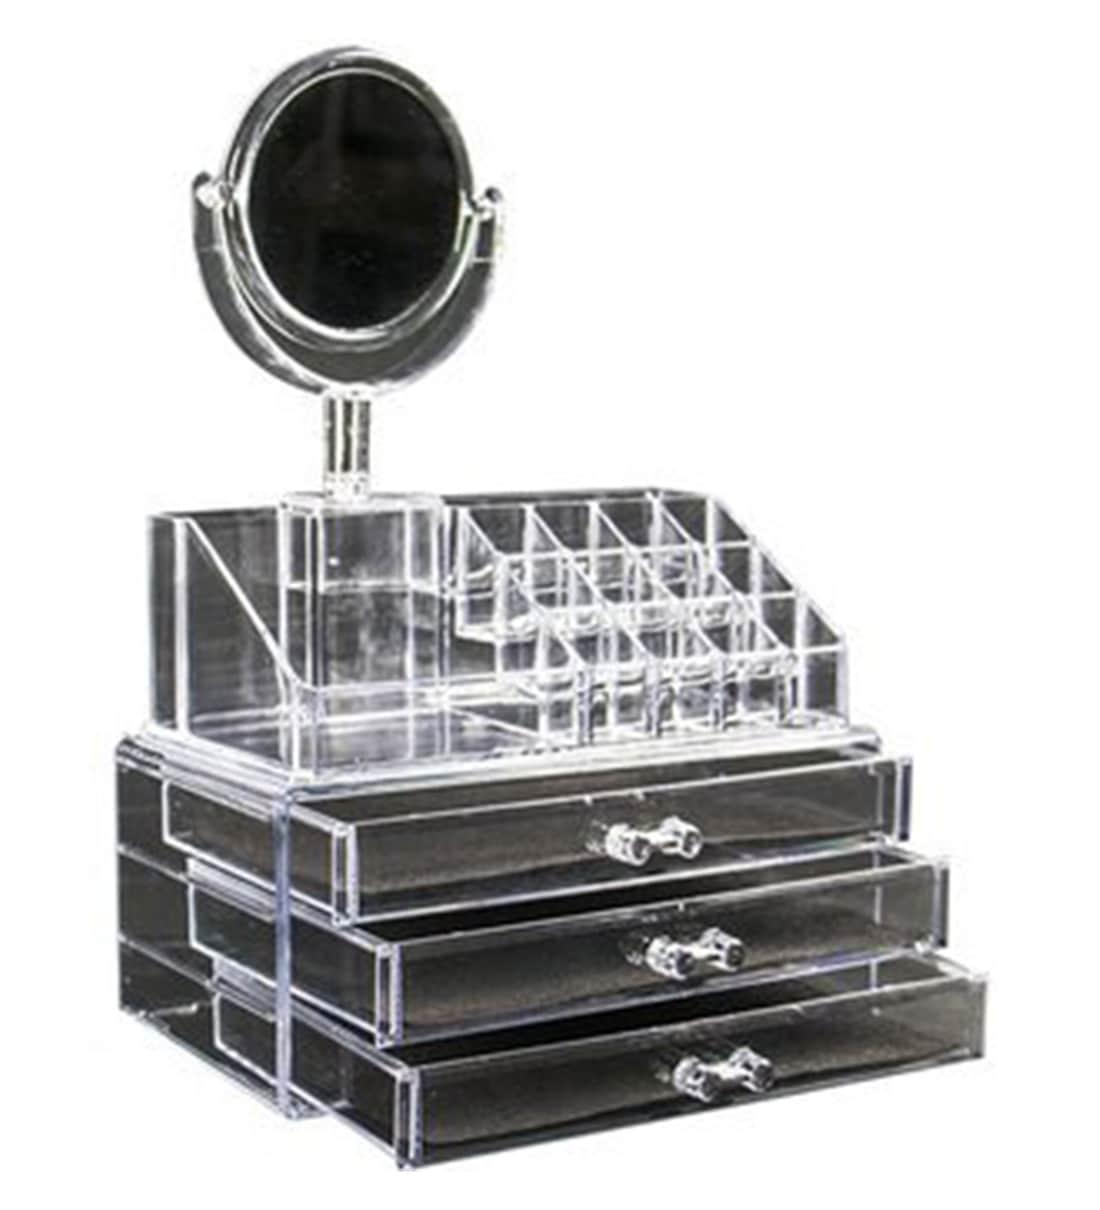 avmart lipstick holder stand 3 drawer with mirror cosmetic organizer makeup vanity box white avma m8oyva